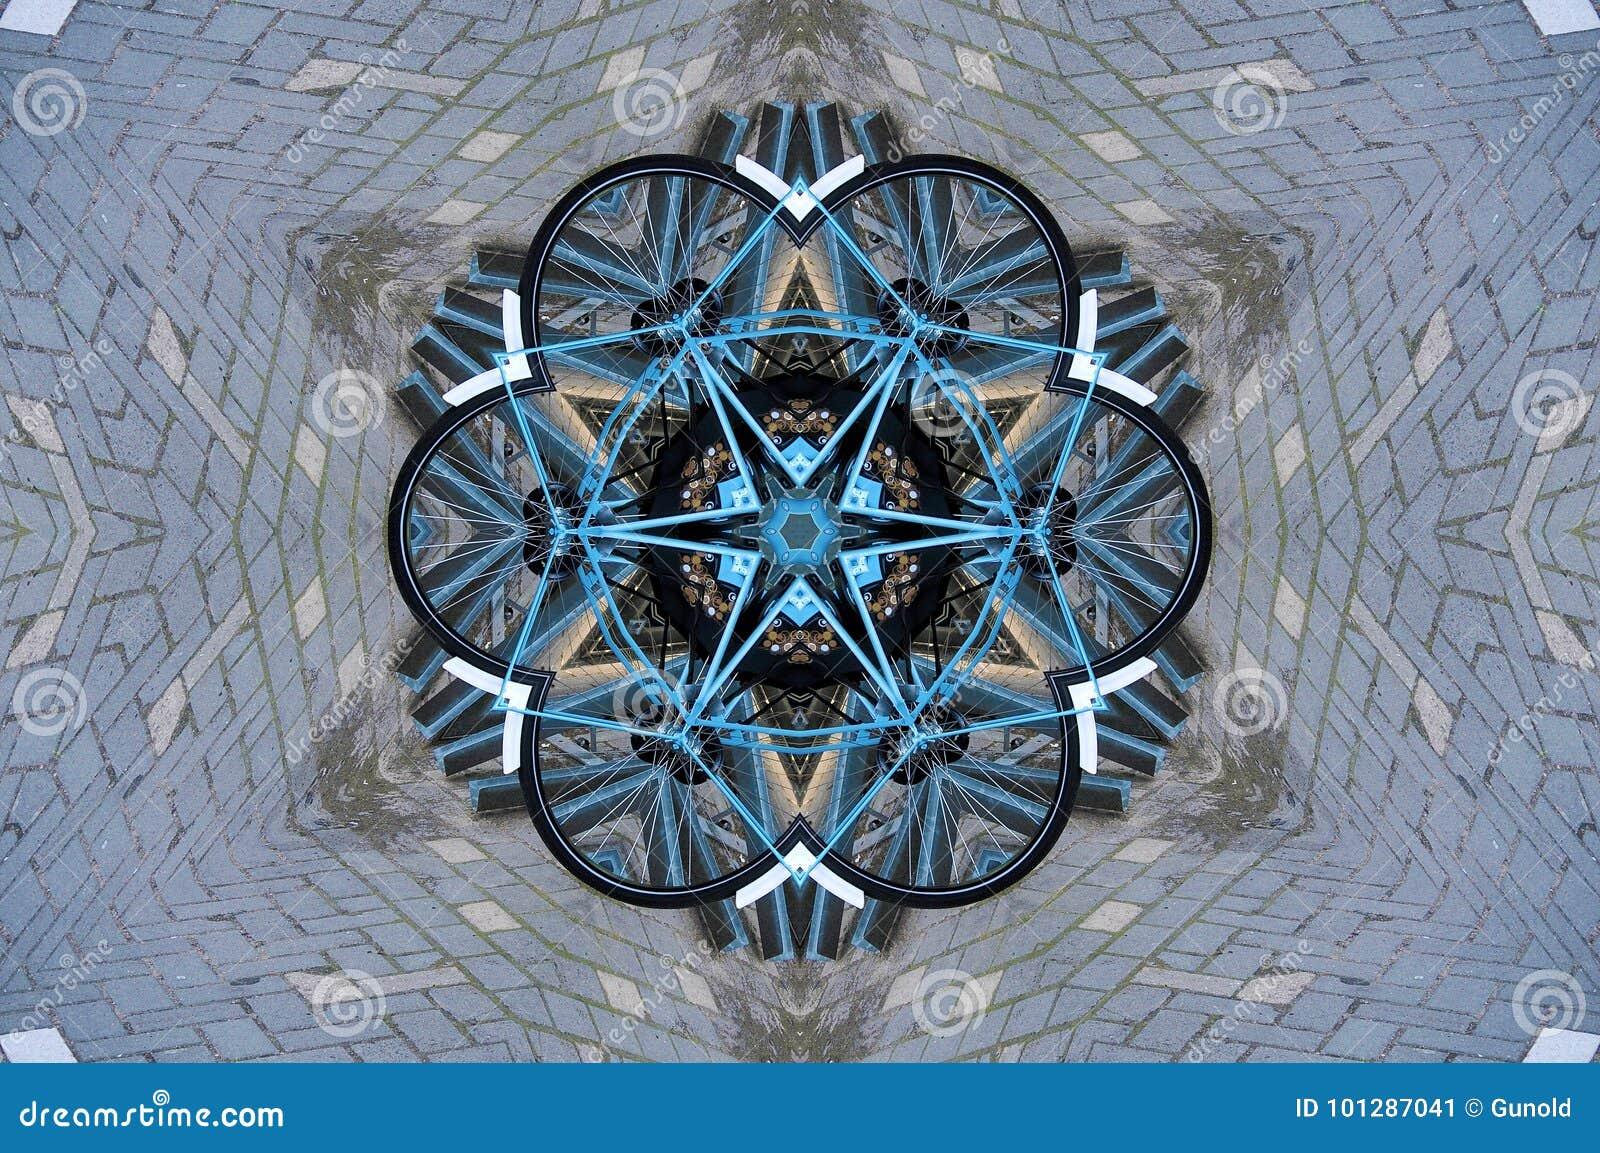 Bicycles through kaleidoscope